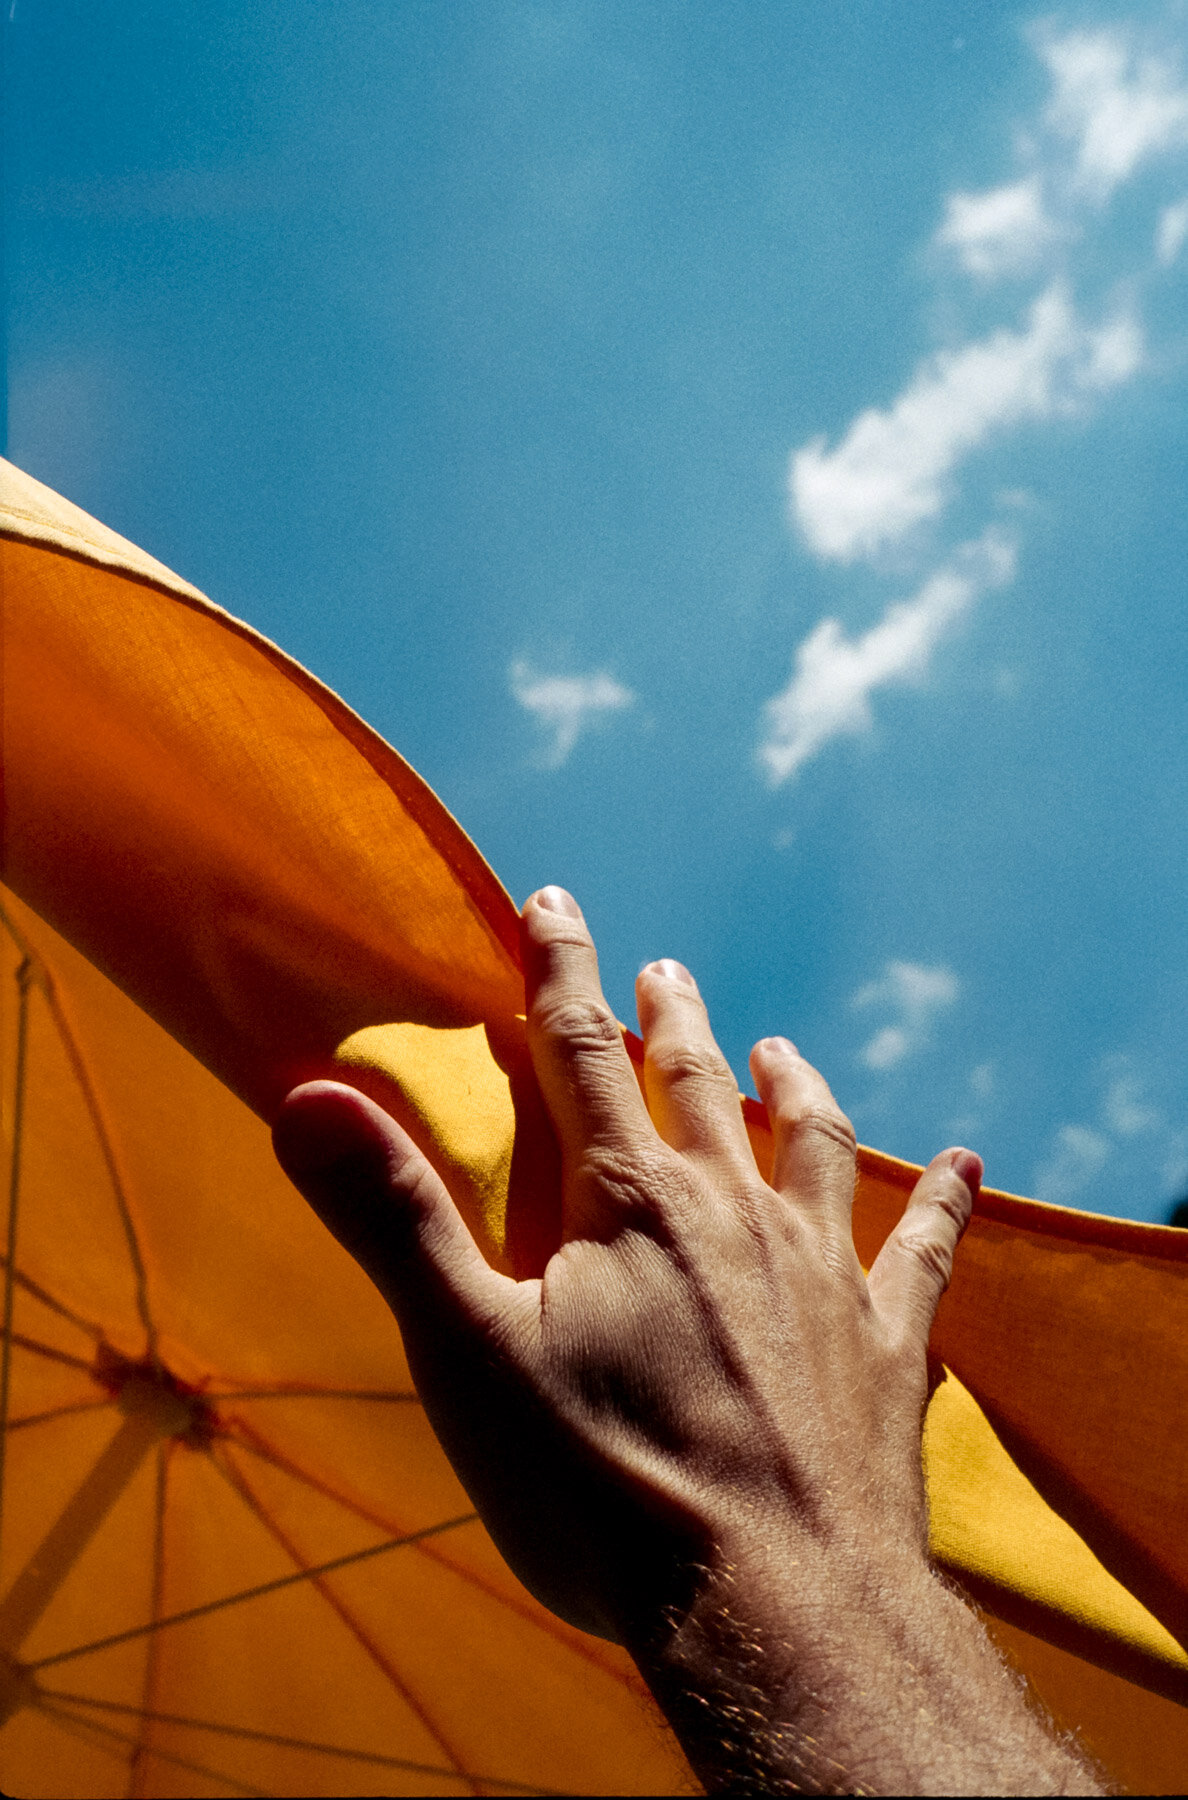 Sonnenschirm Hand